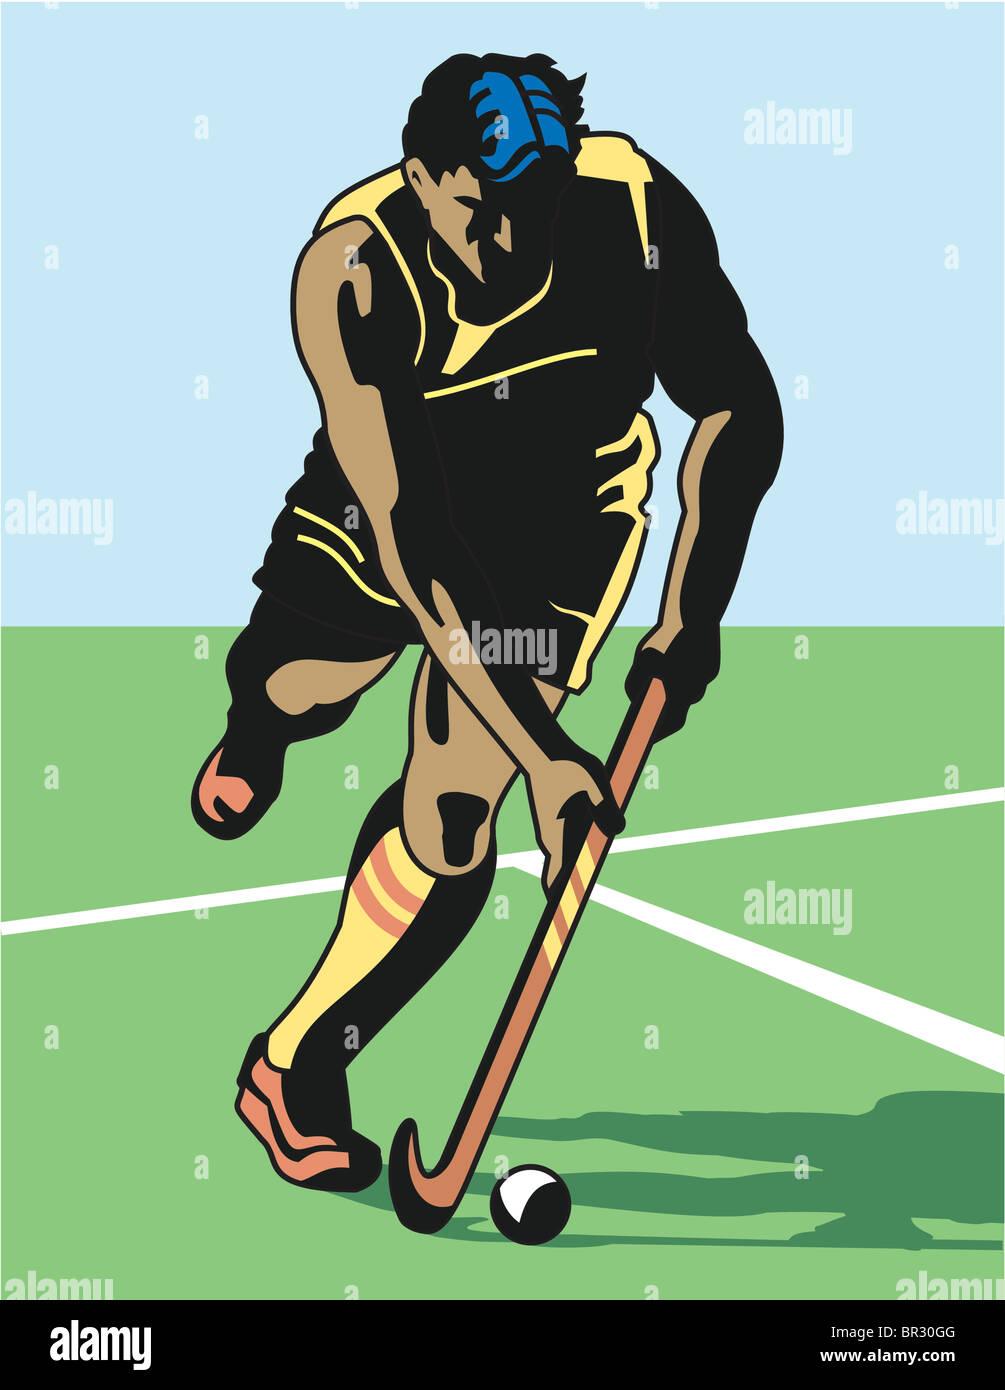 A man playing field hockey - Stock Image